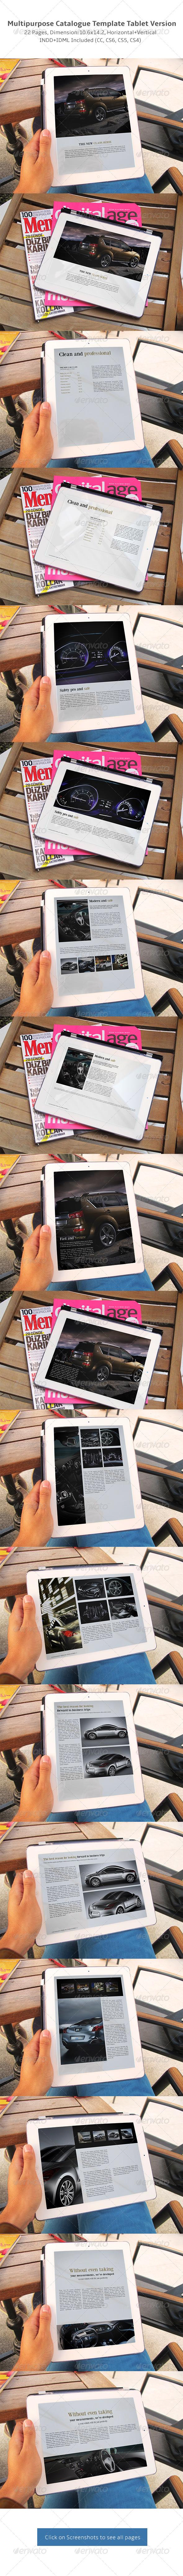 Multipurpose Catalogs Template Tablet Version - Digital Books ePublishing